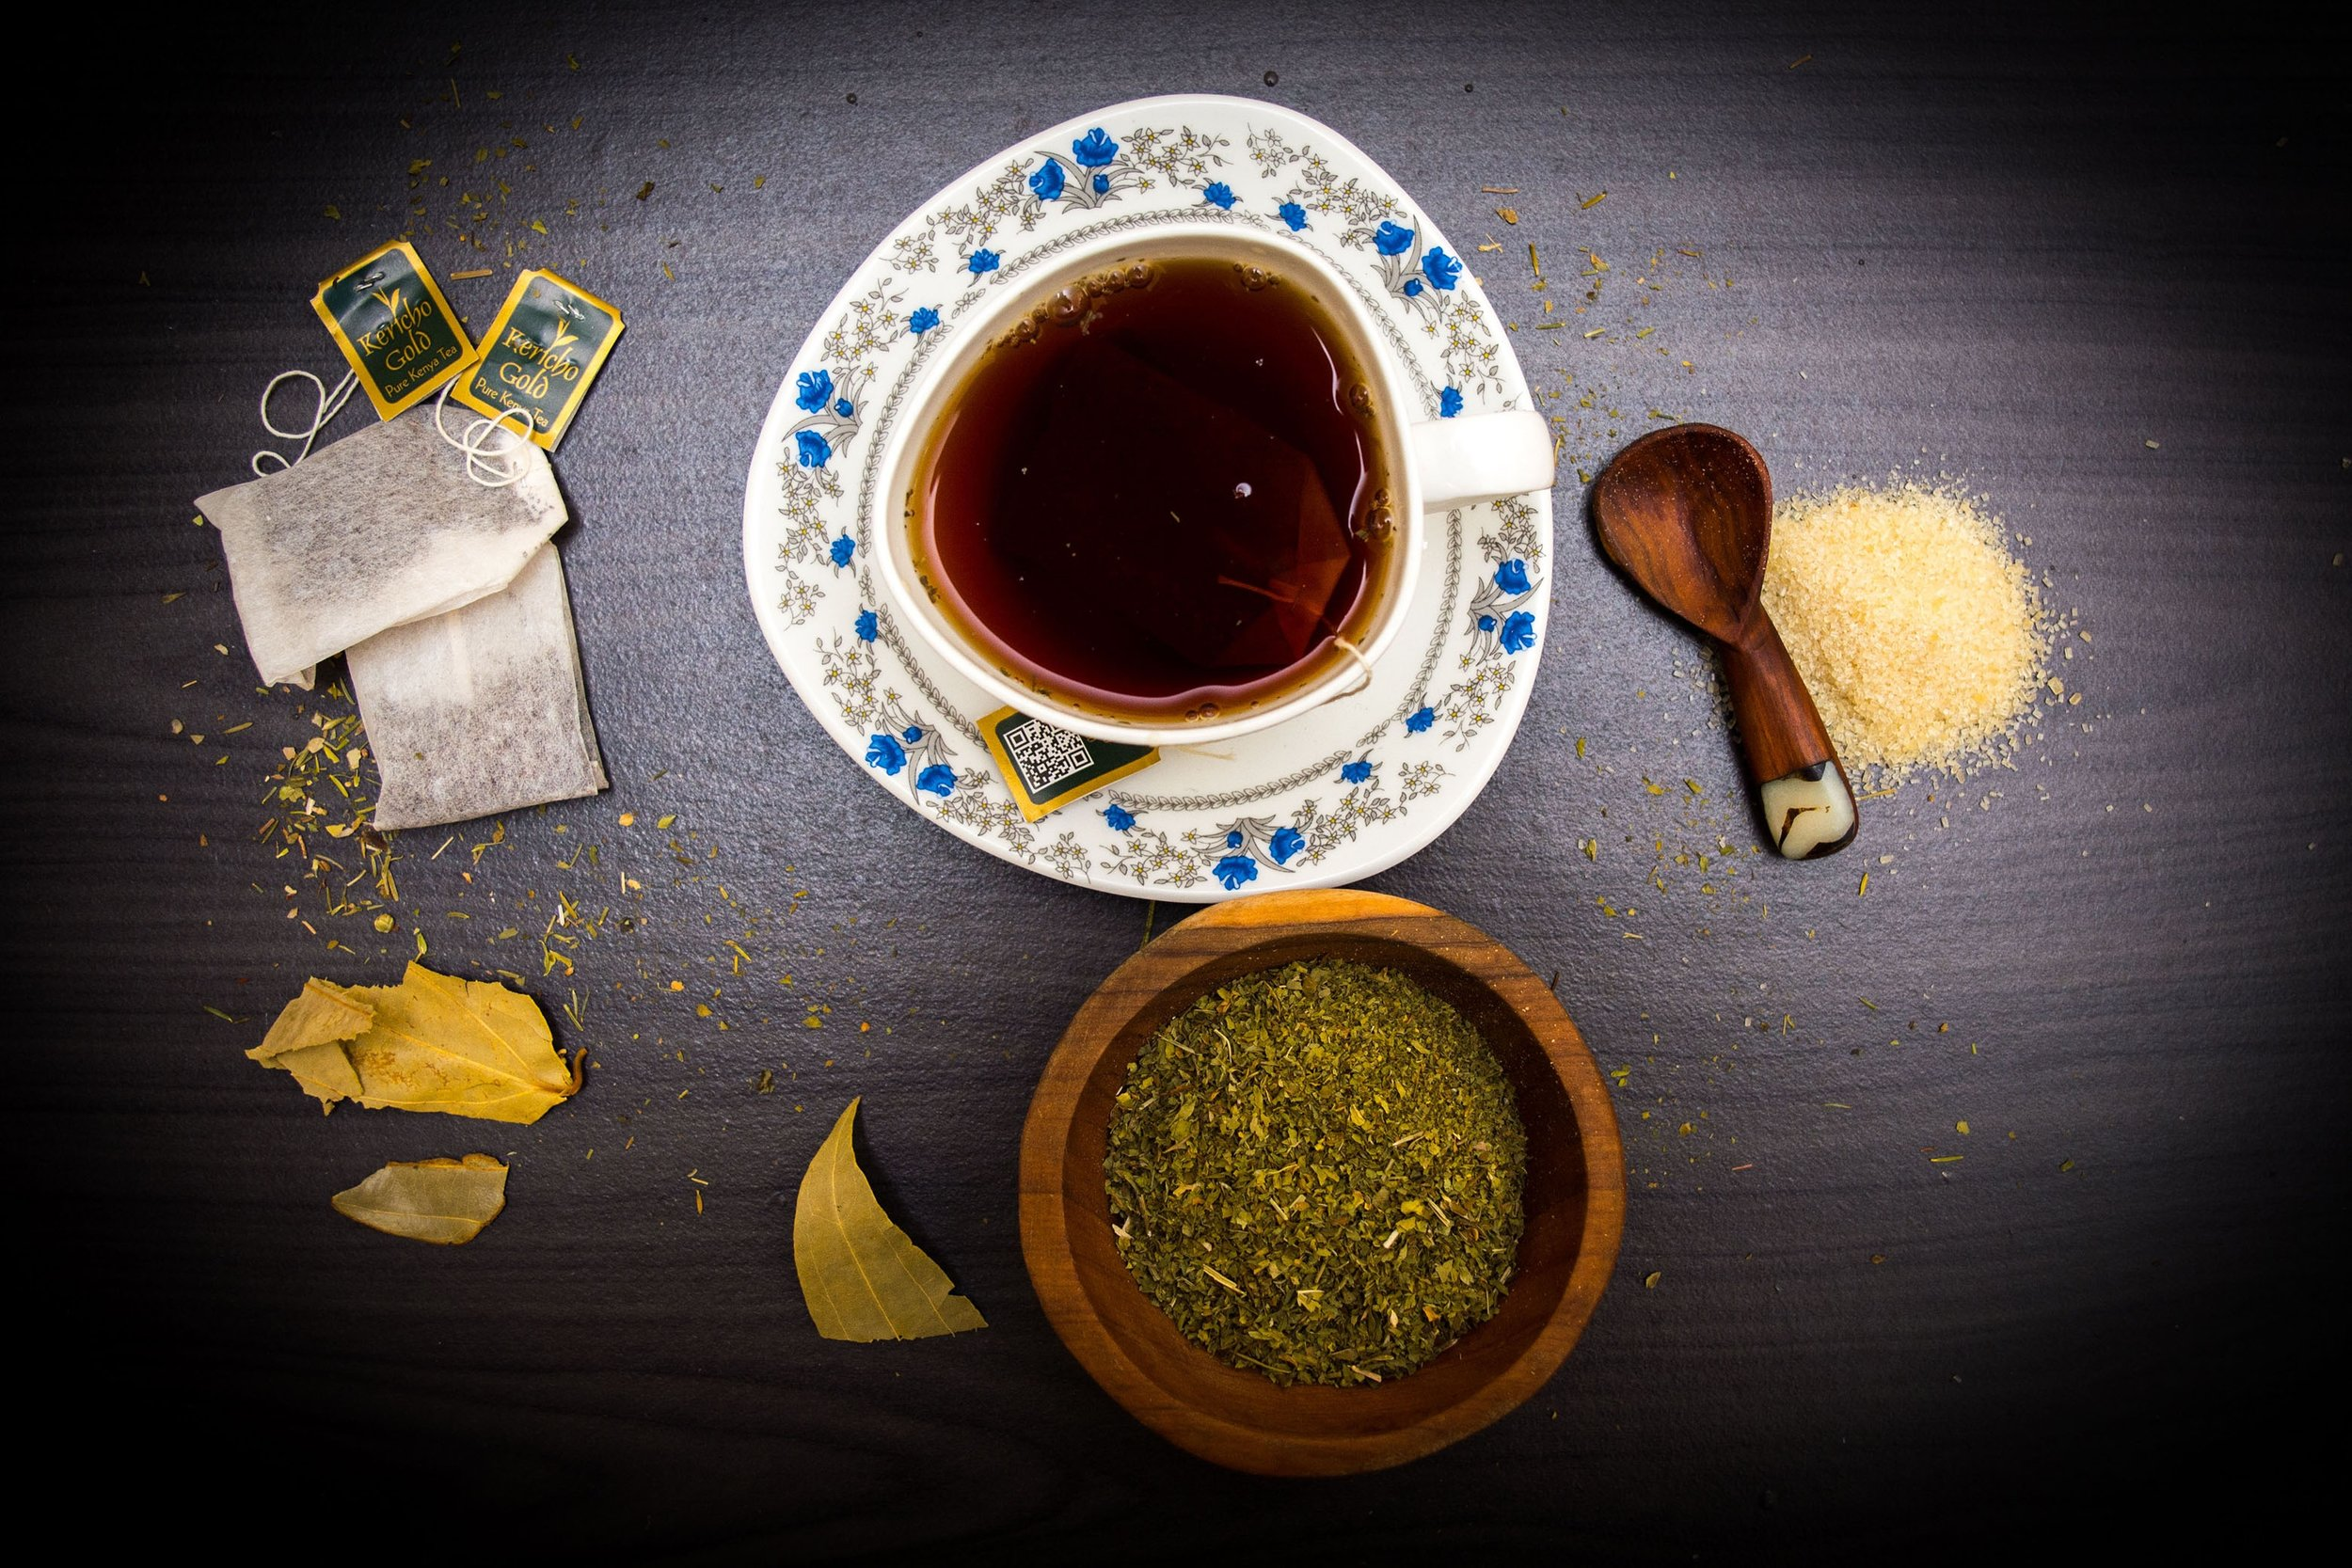 tea-food-green-ingredient-162853.jpeg